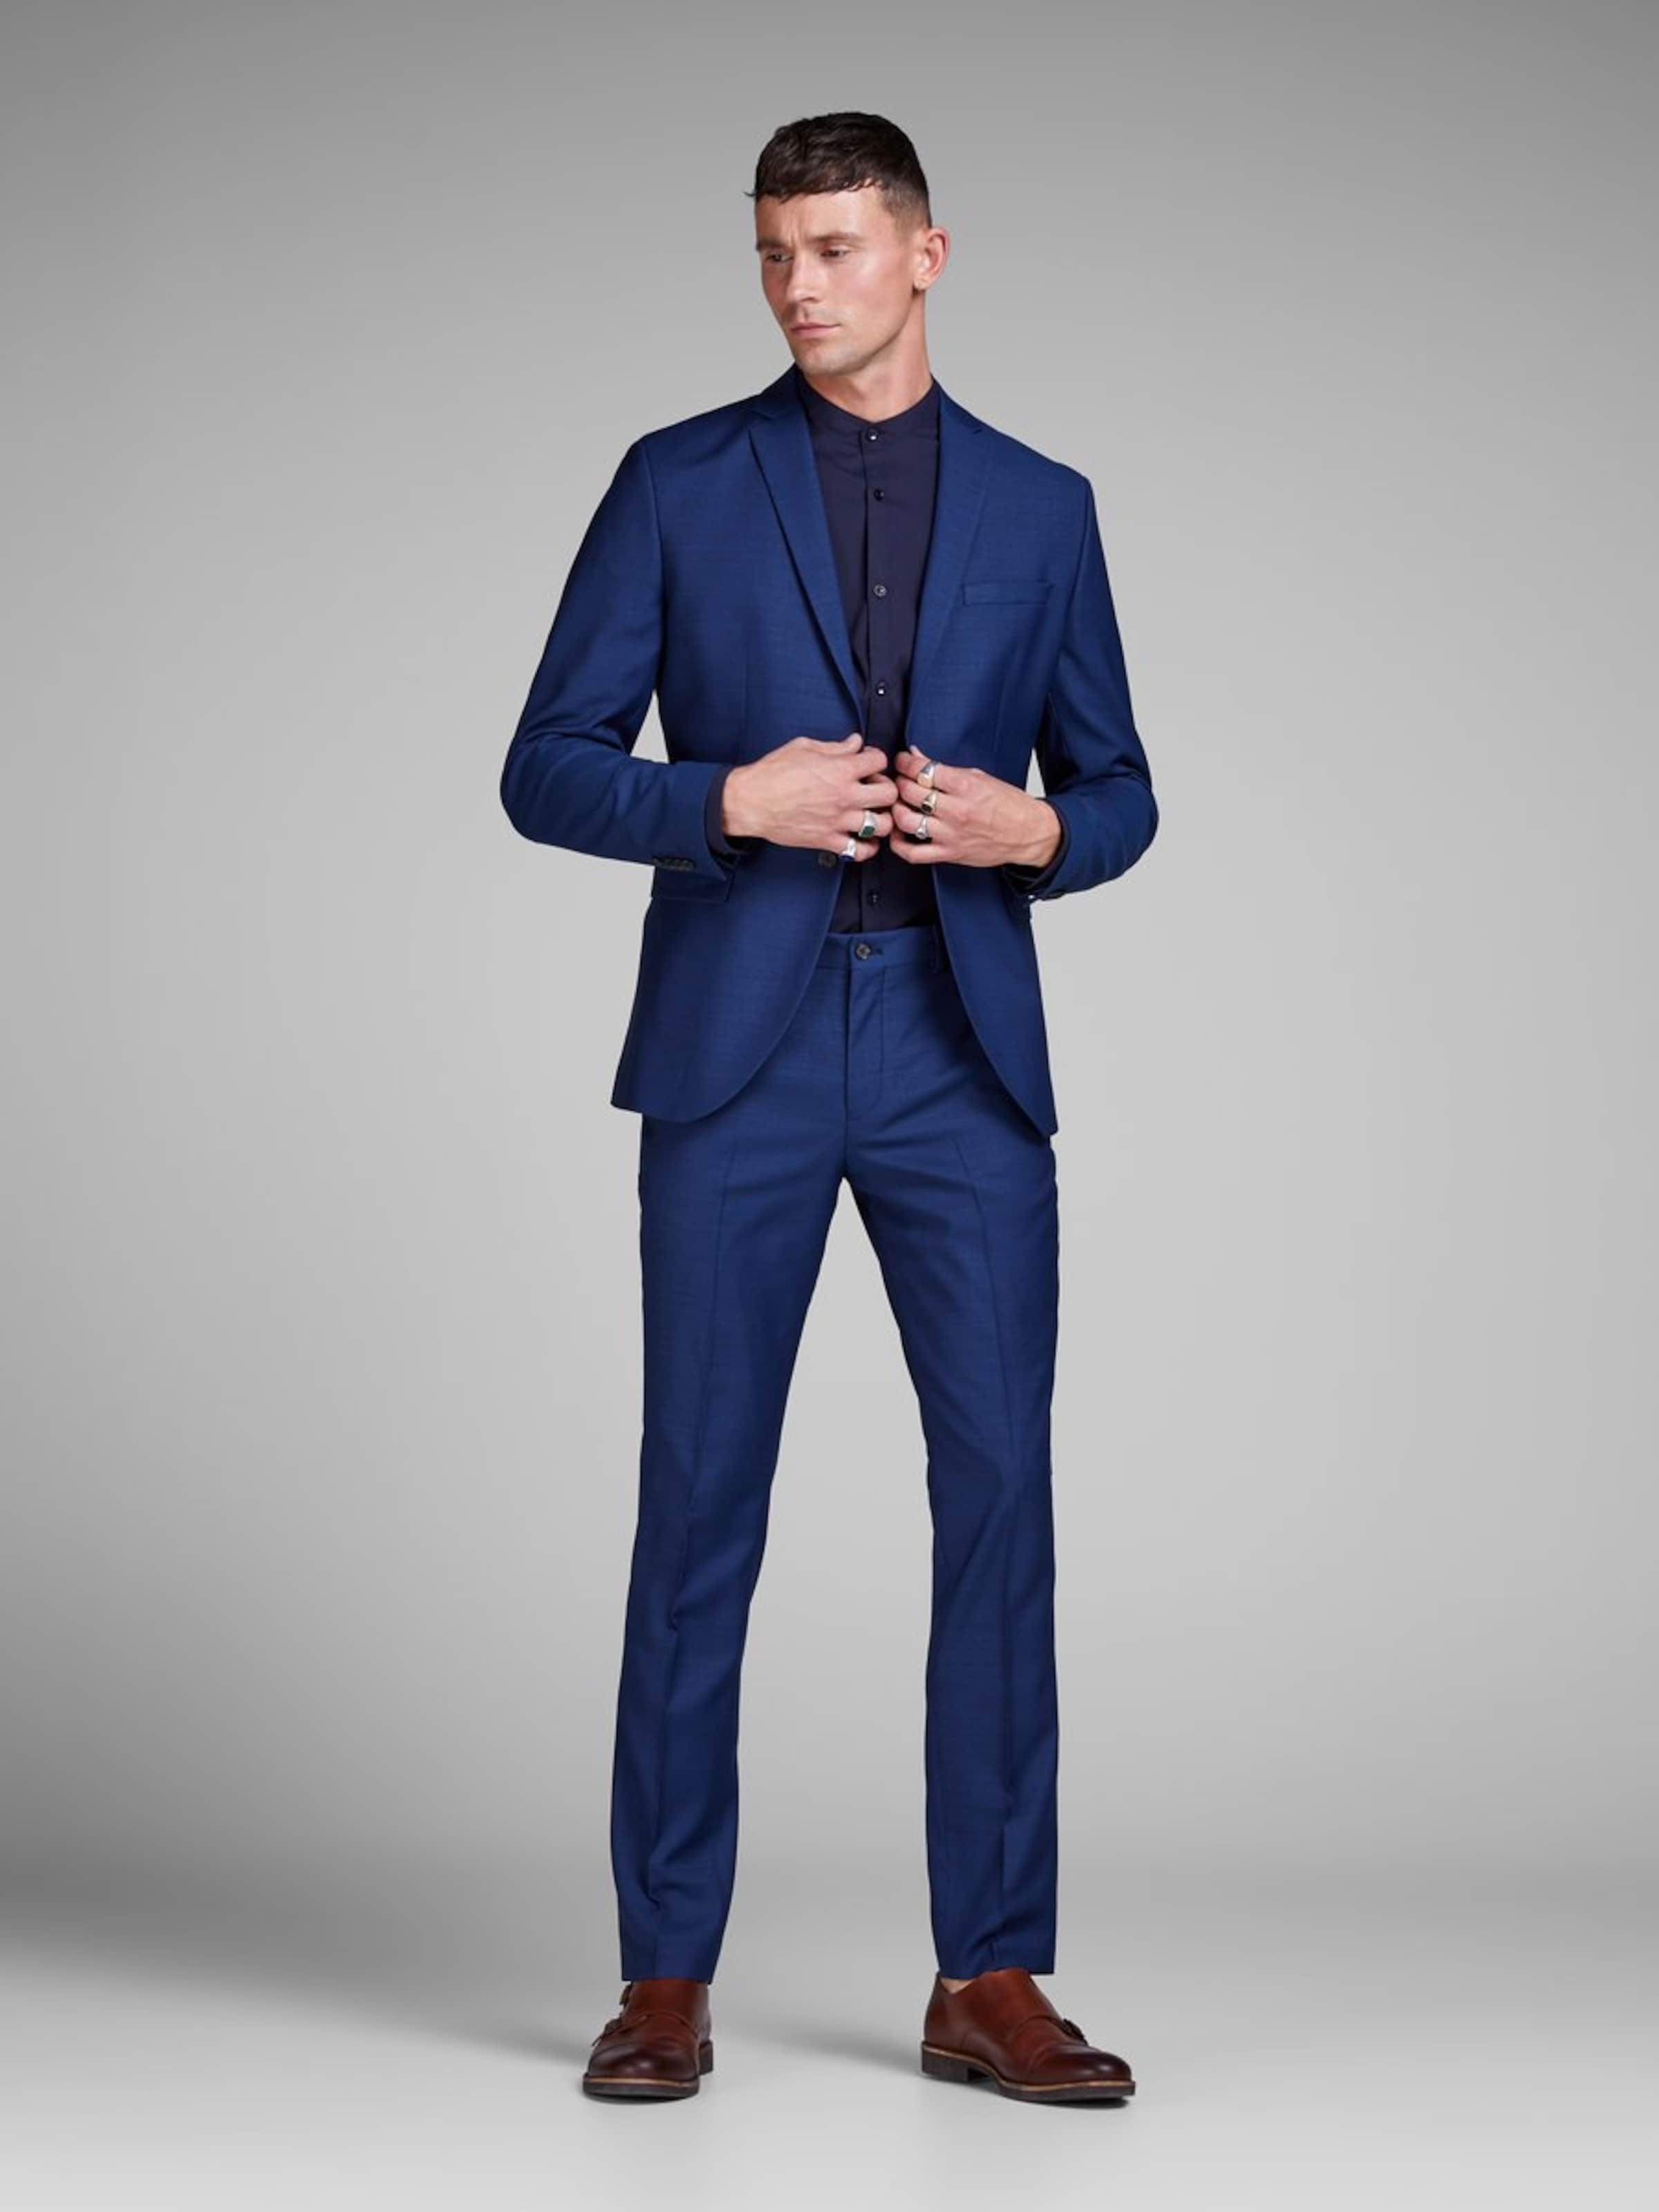 En Pantalon Jackamp; Bleu À Plis Jones 15T3lKcuFJ